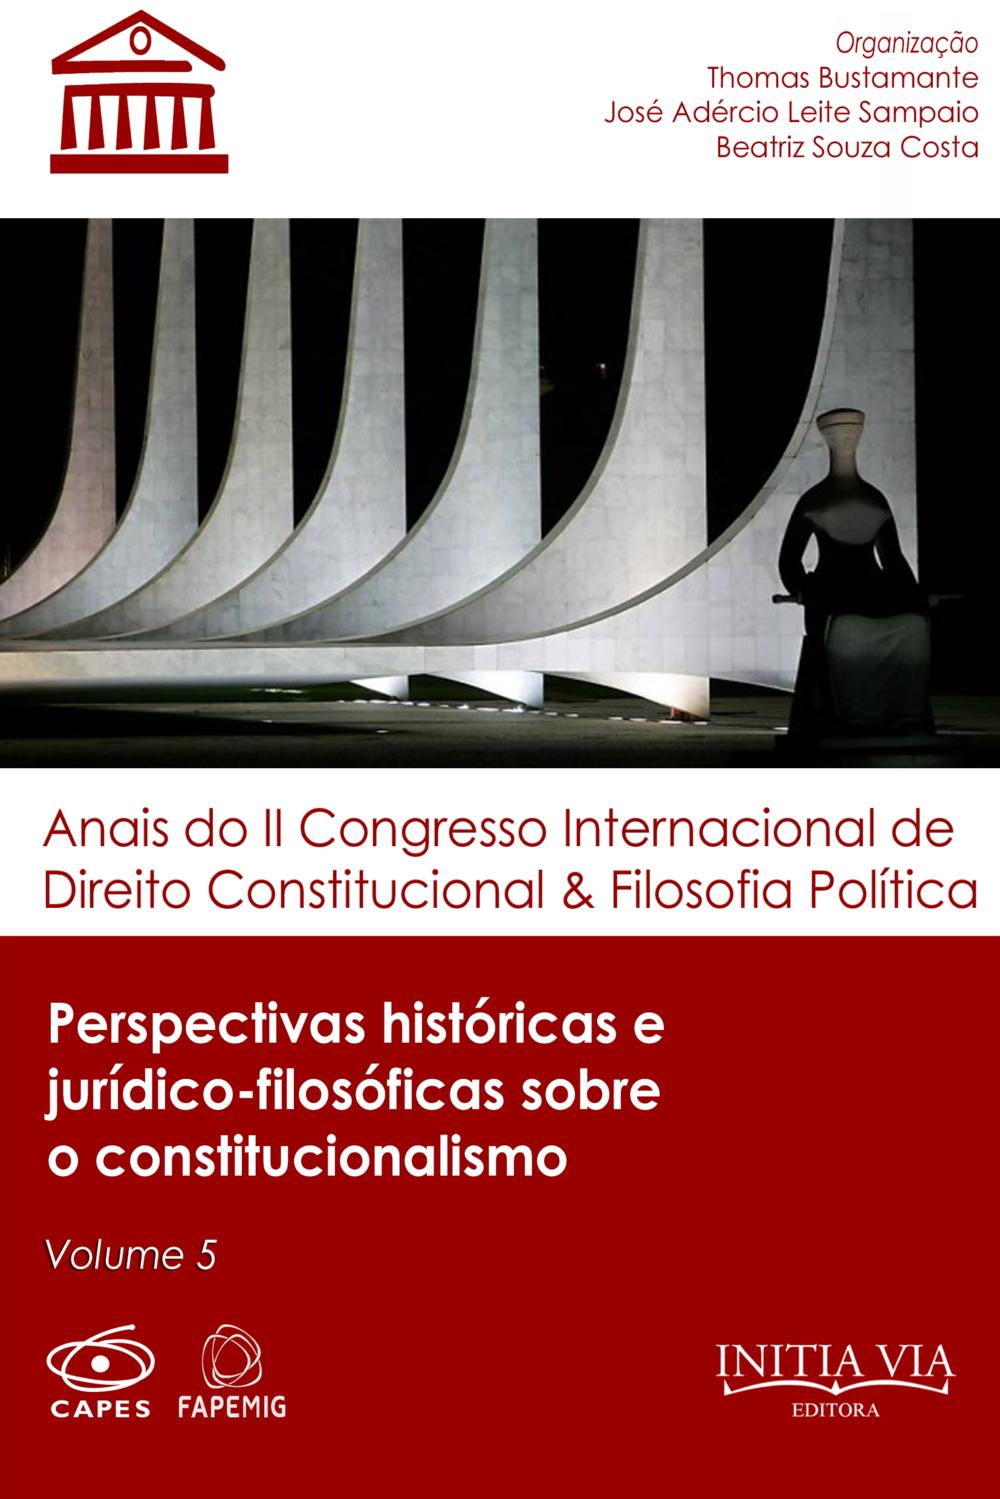 Bustamante_Congresso_DCFP15_V05.png